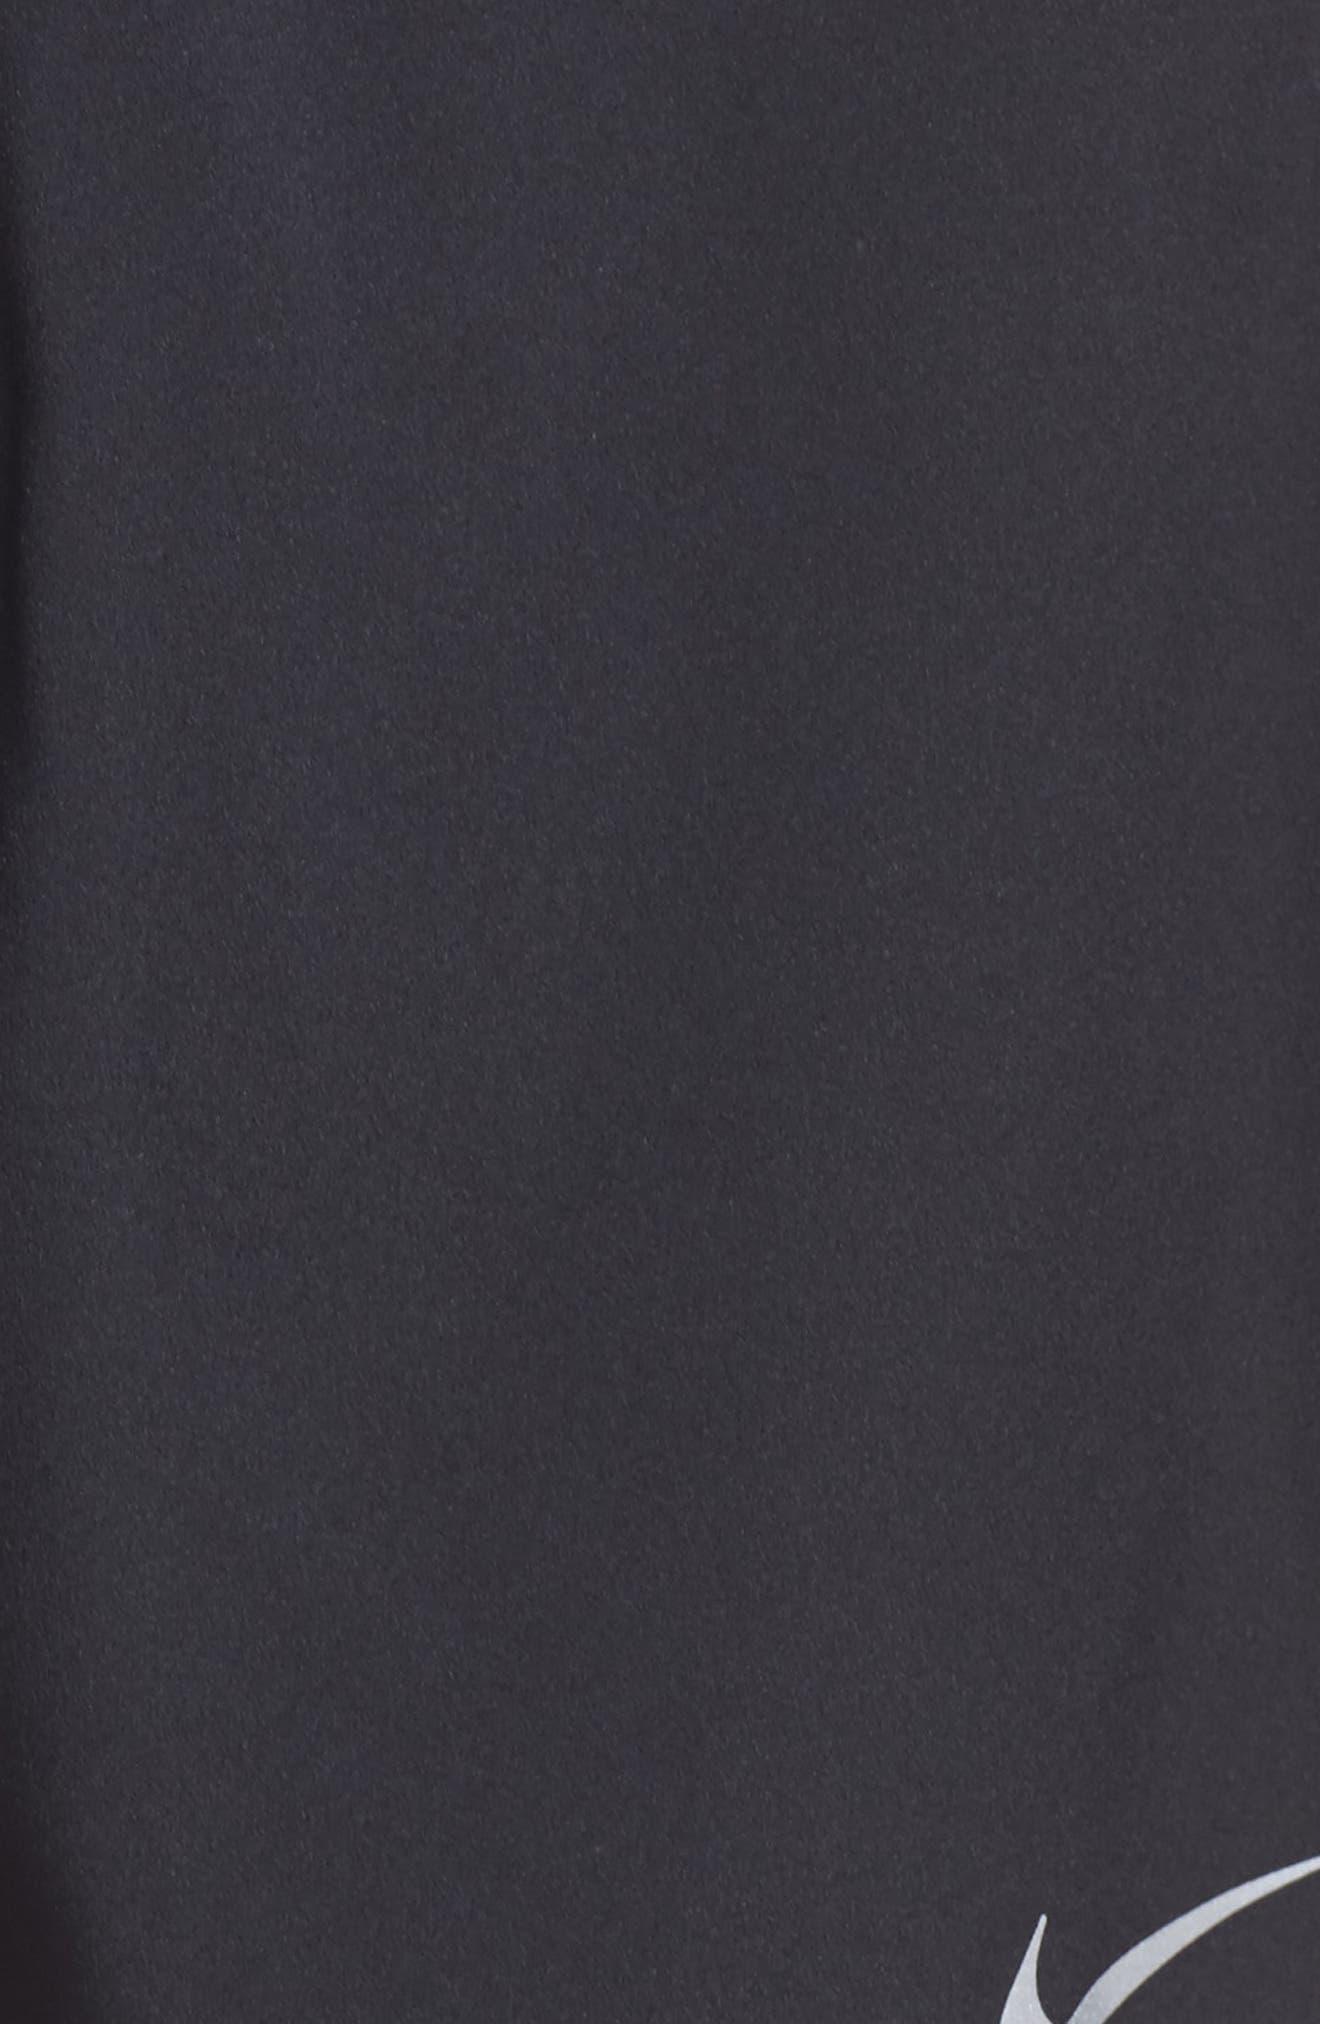 Flex Running Shorts,                             Alternate thumbnail 5, color,                             Black